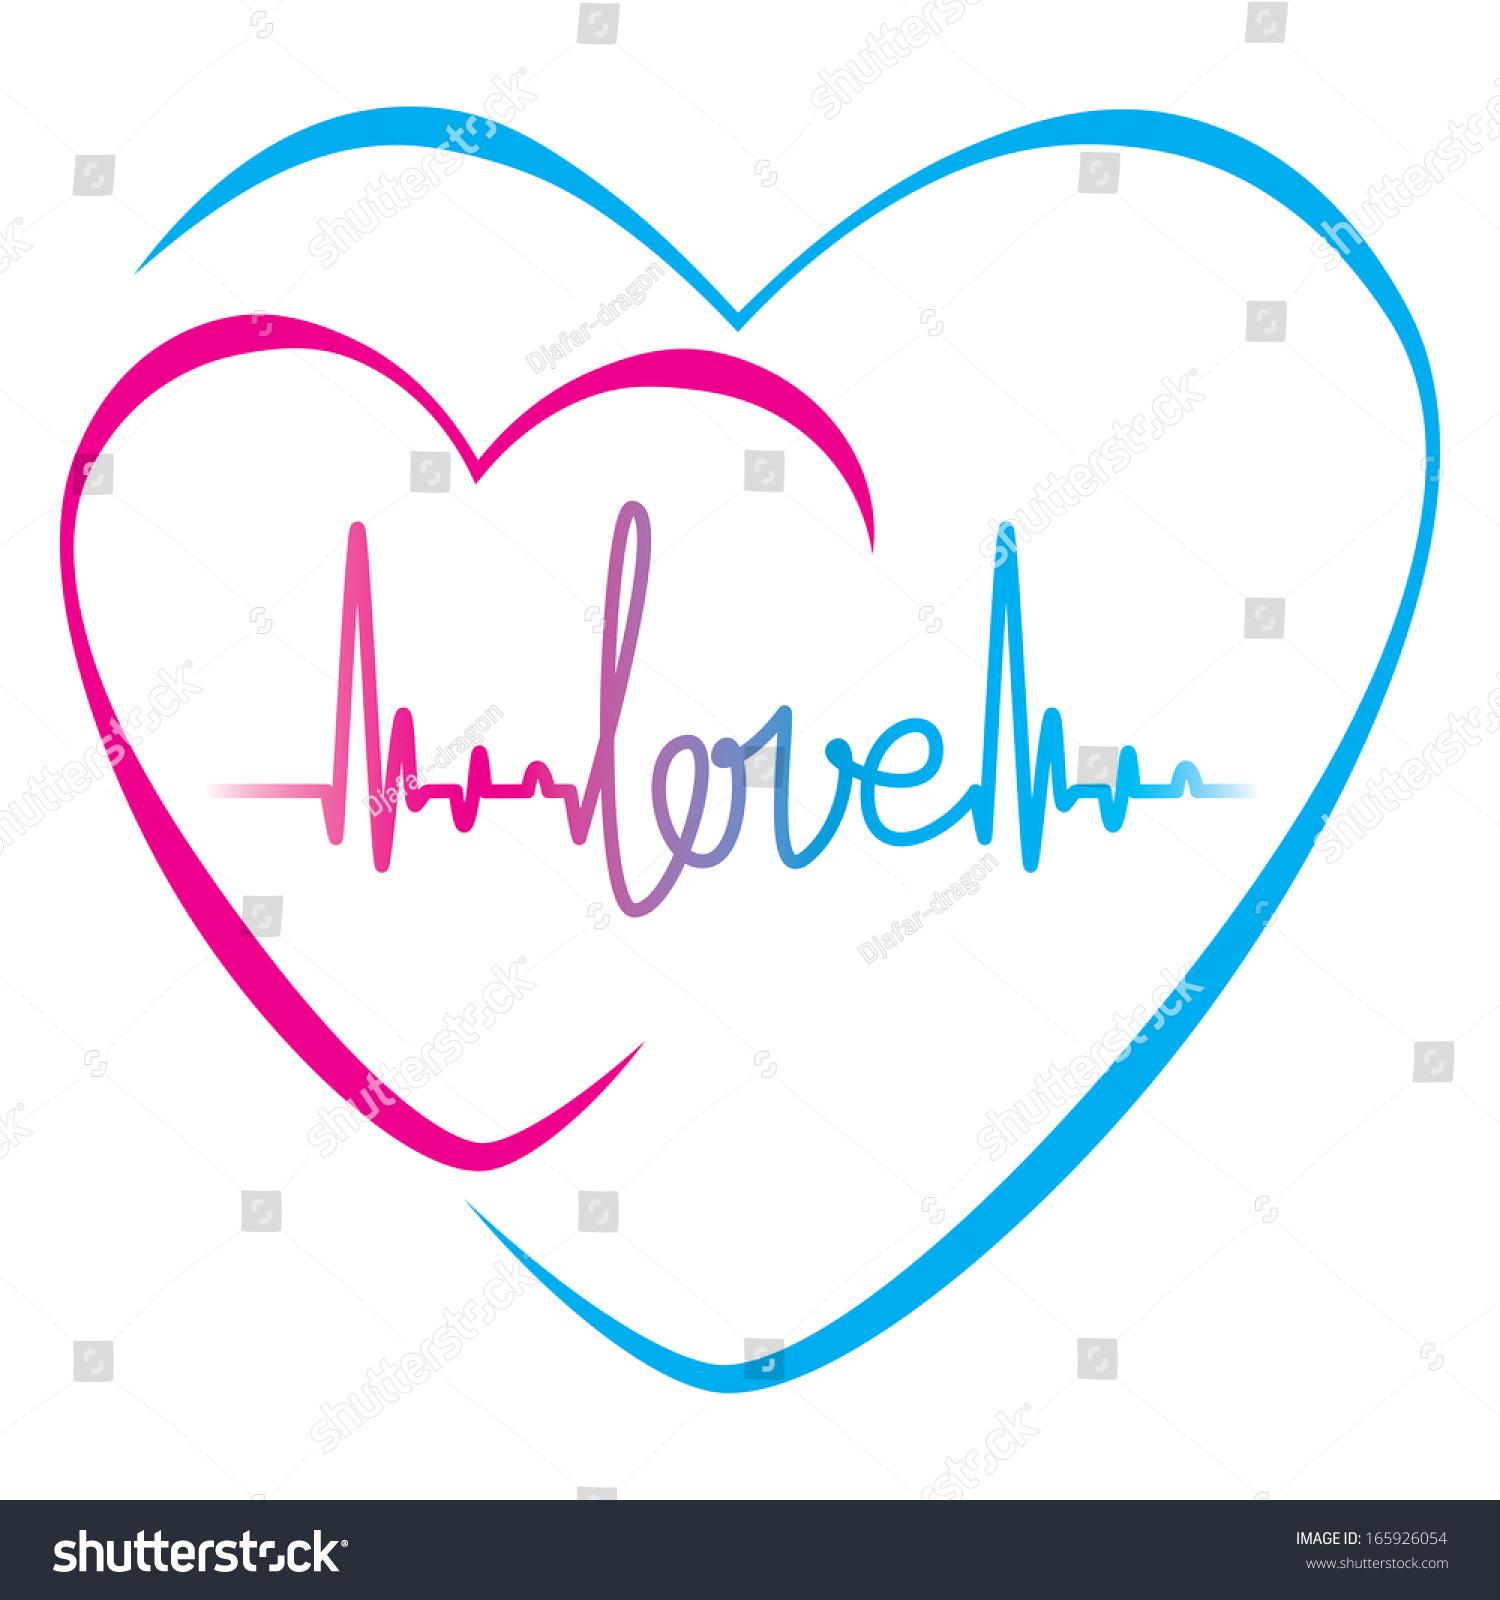 Heartbeat love text heart symbol vector stock vector 165926054 heartbeat with love text and heart symbol vector illustration background biocorpaavc